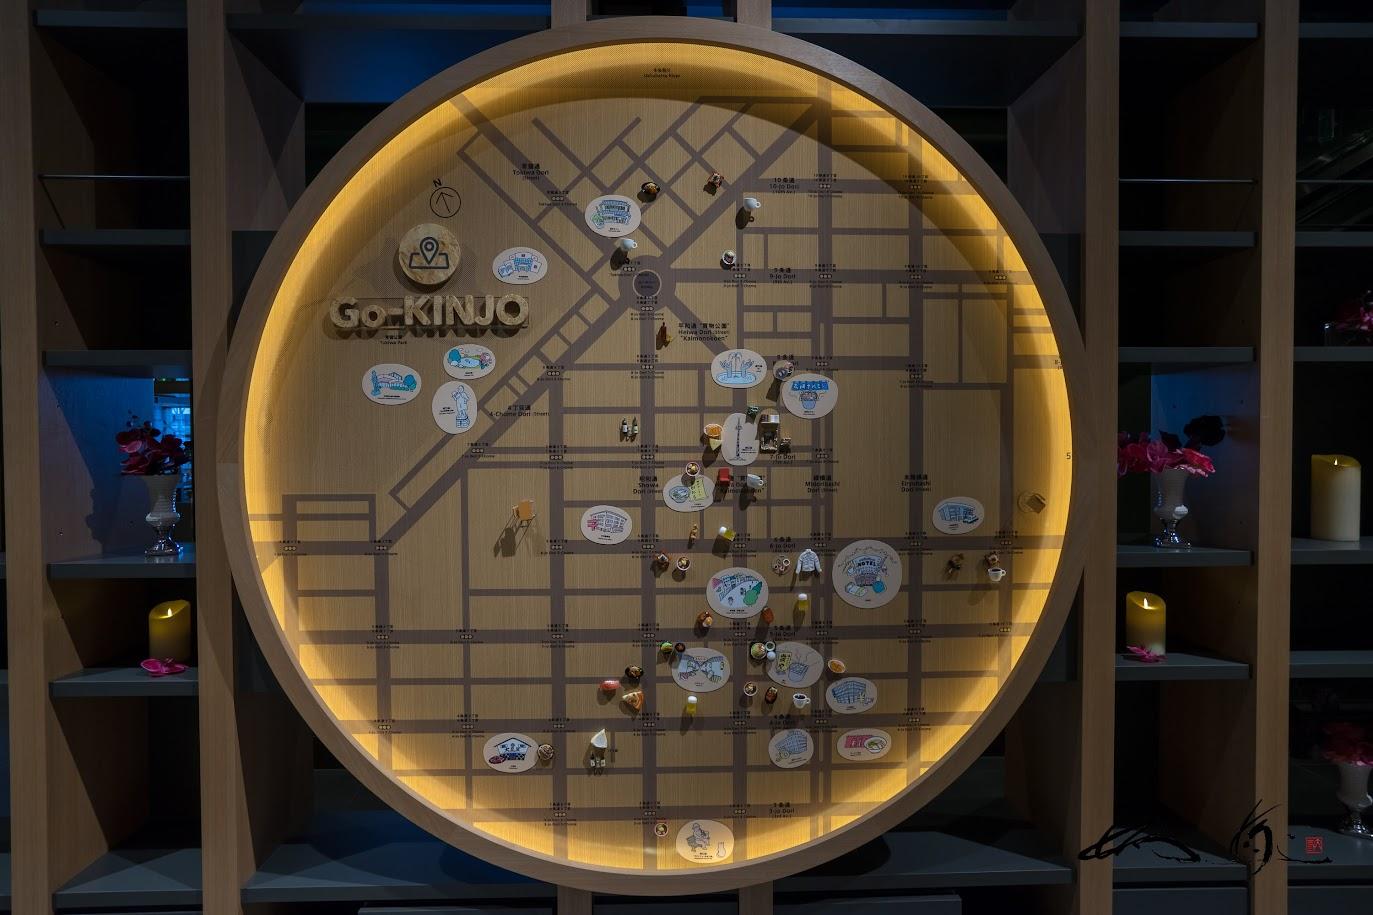 「Go-KINJO」は、直径2mの木製の大きなマップ